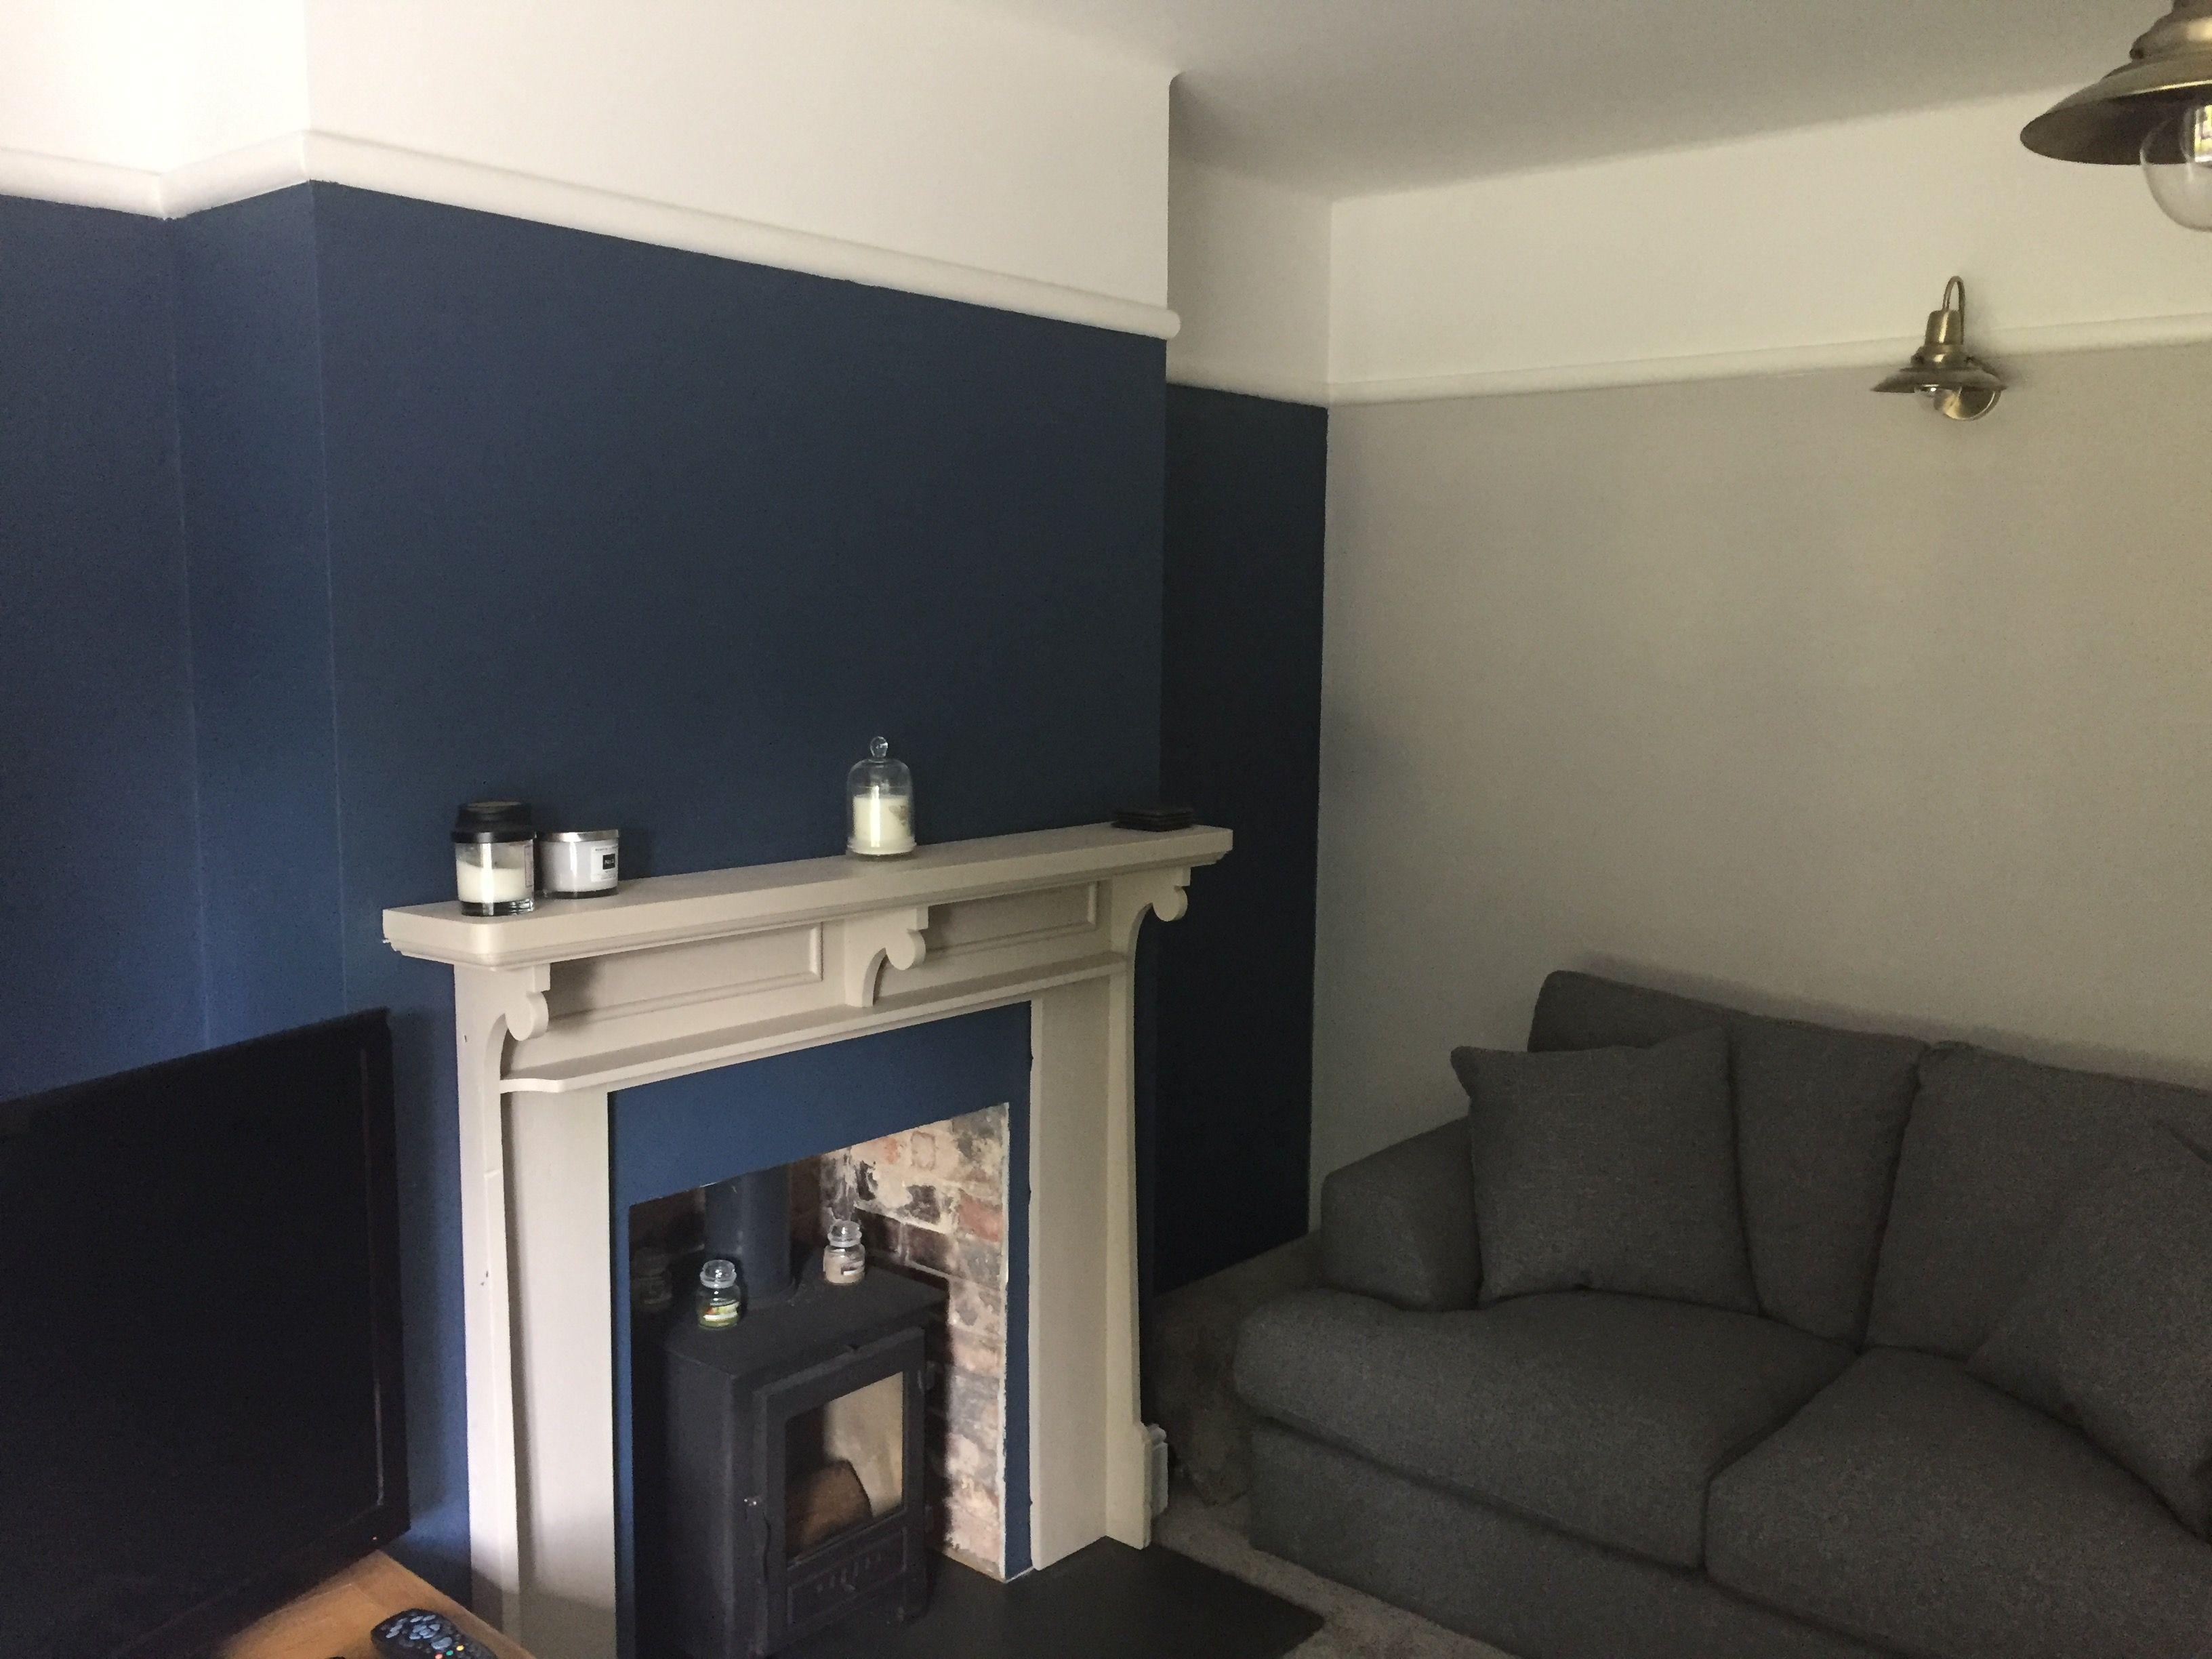 Farrow & Ball stiffkey blue and cornforth white lounge.